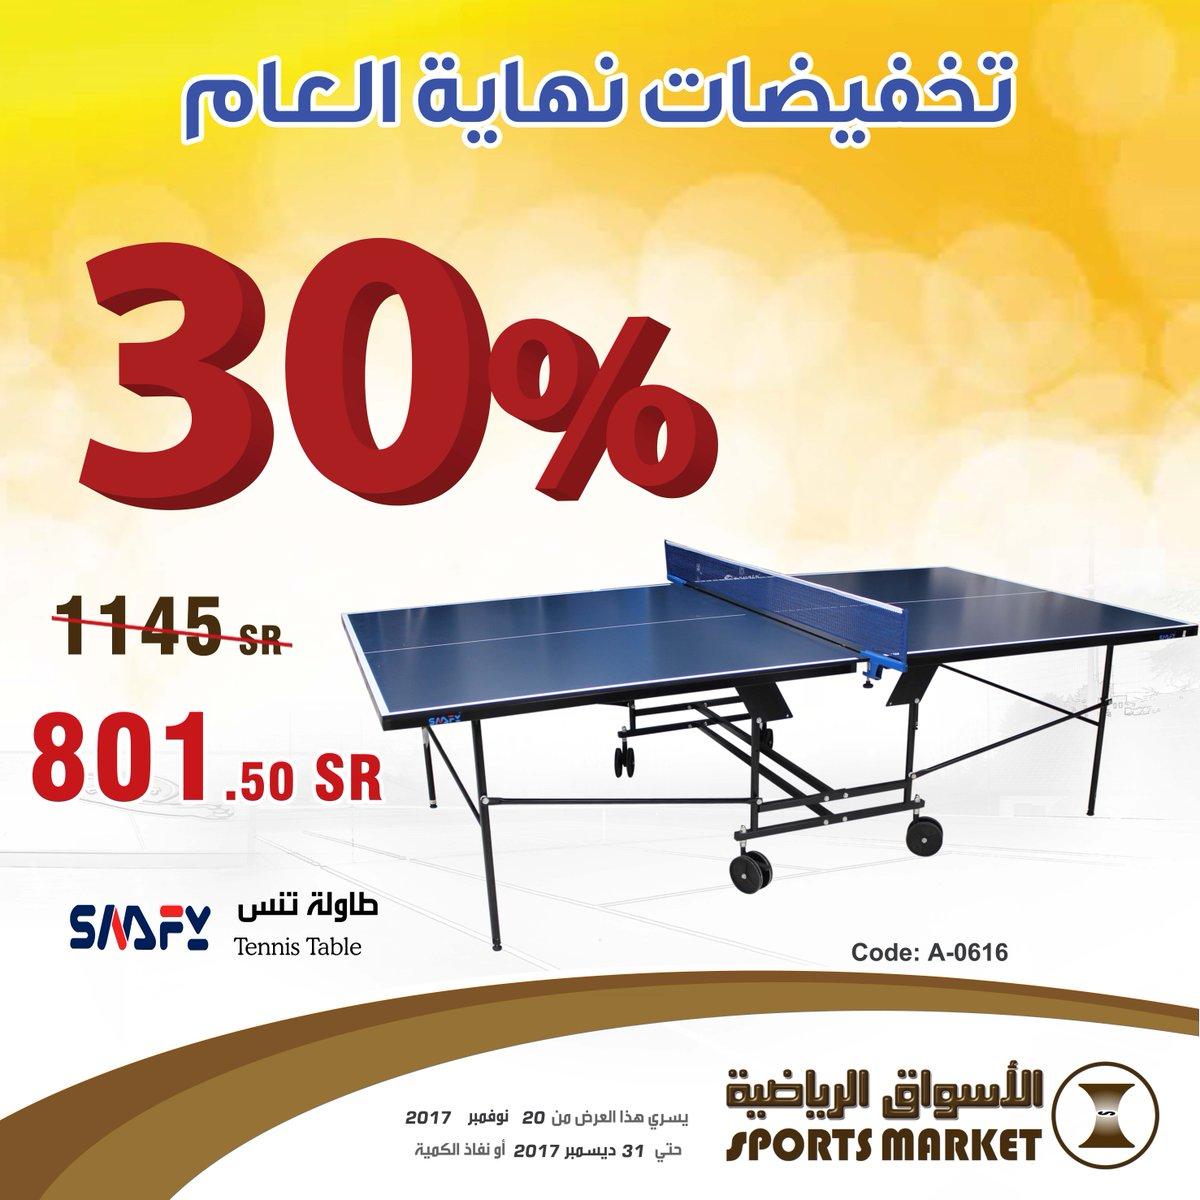 06839db66 Sport Market - الأسواق الرياضية (@SportsMarket_sa) | Twitter